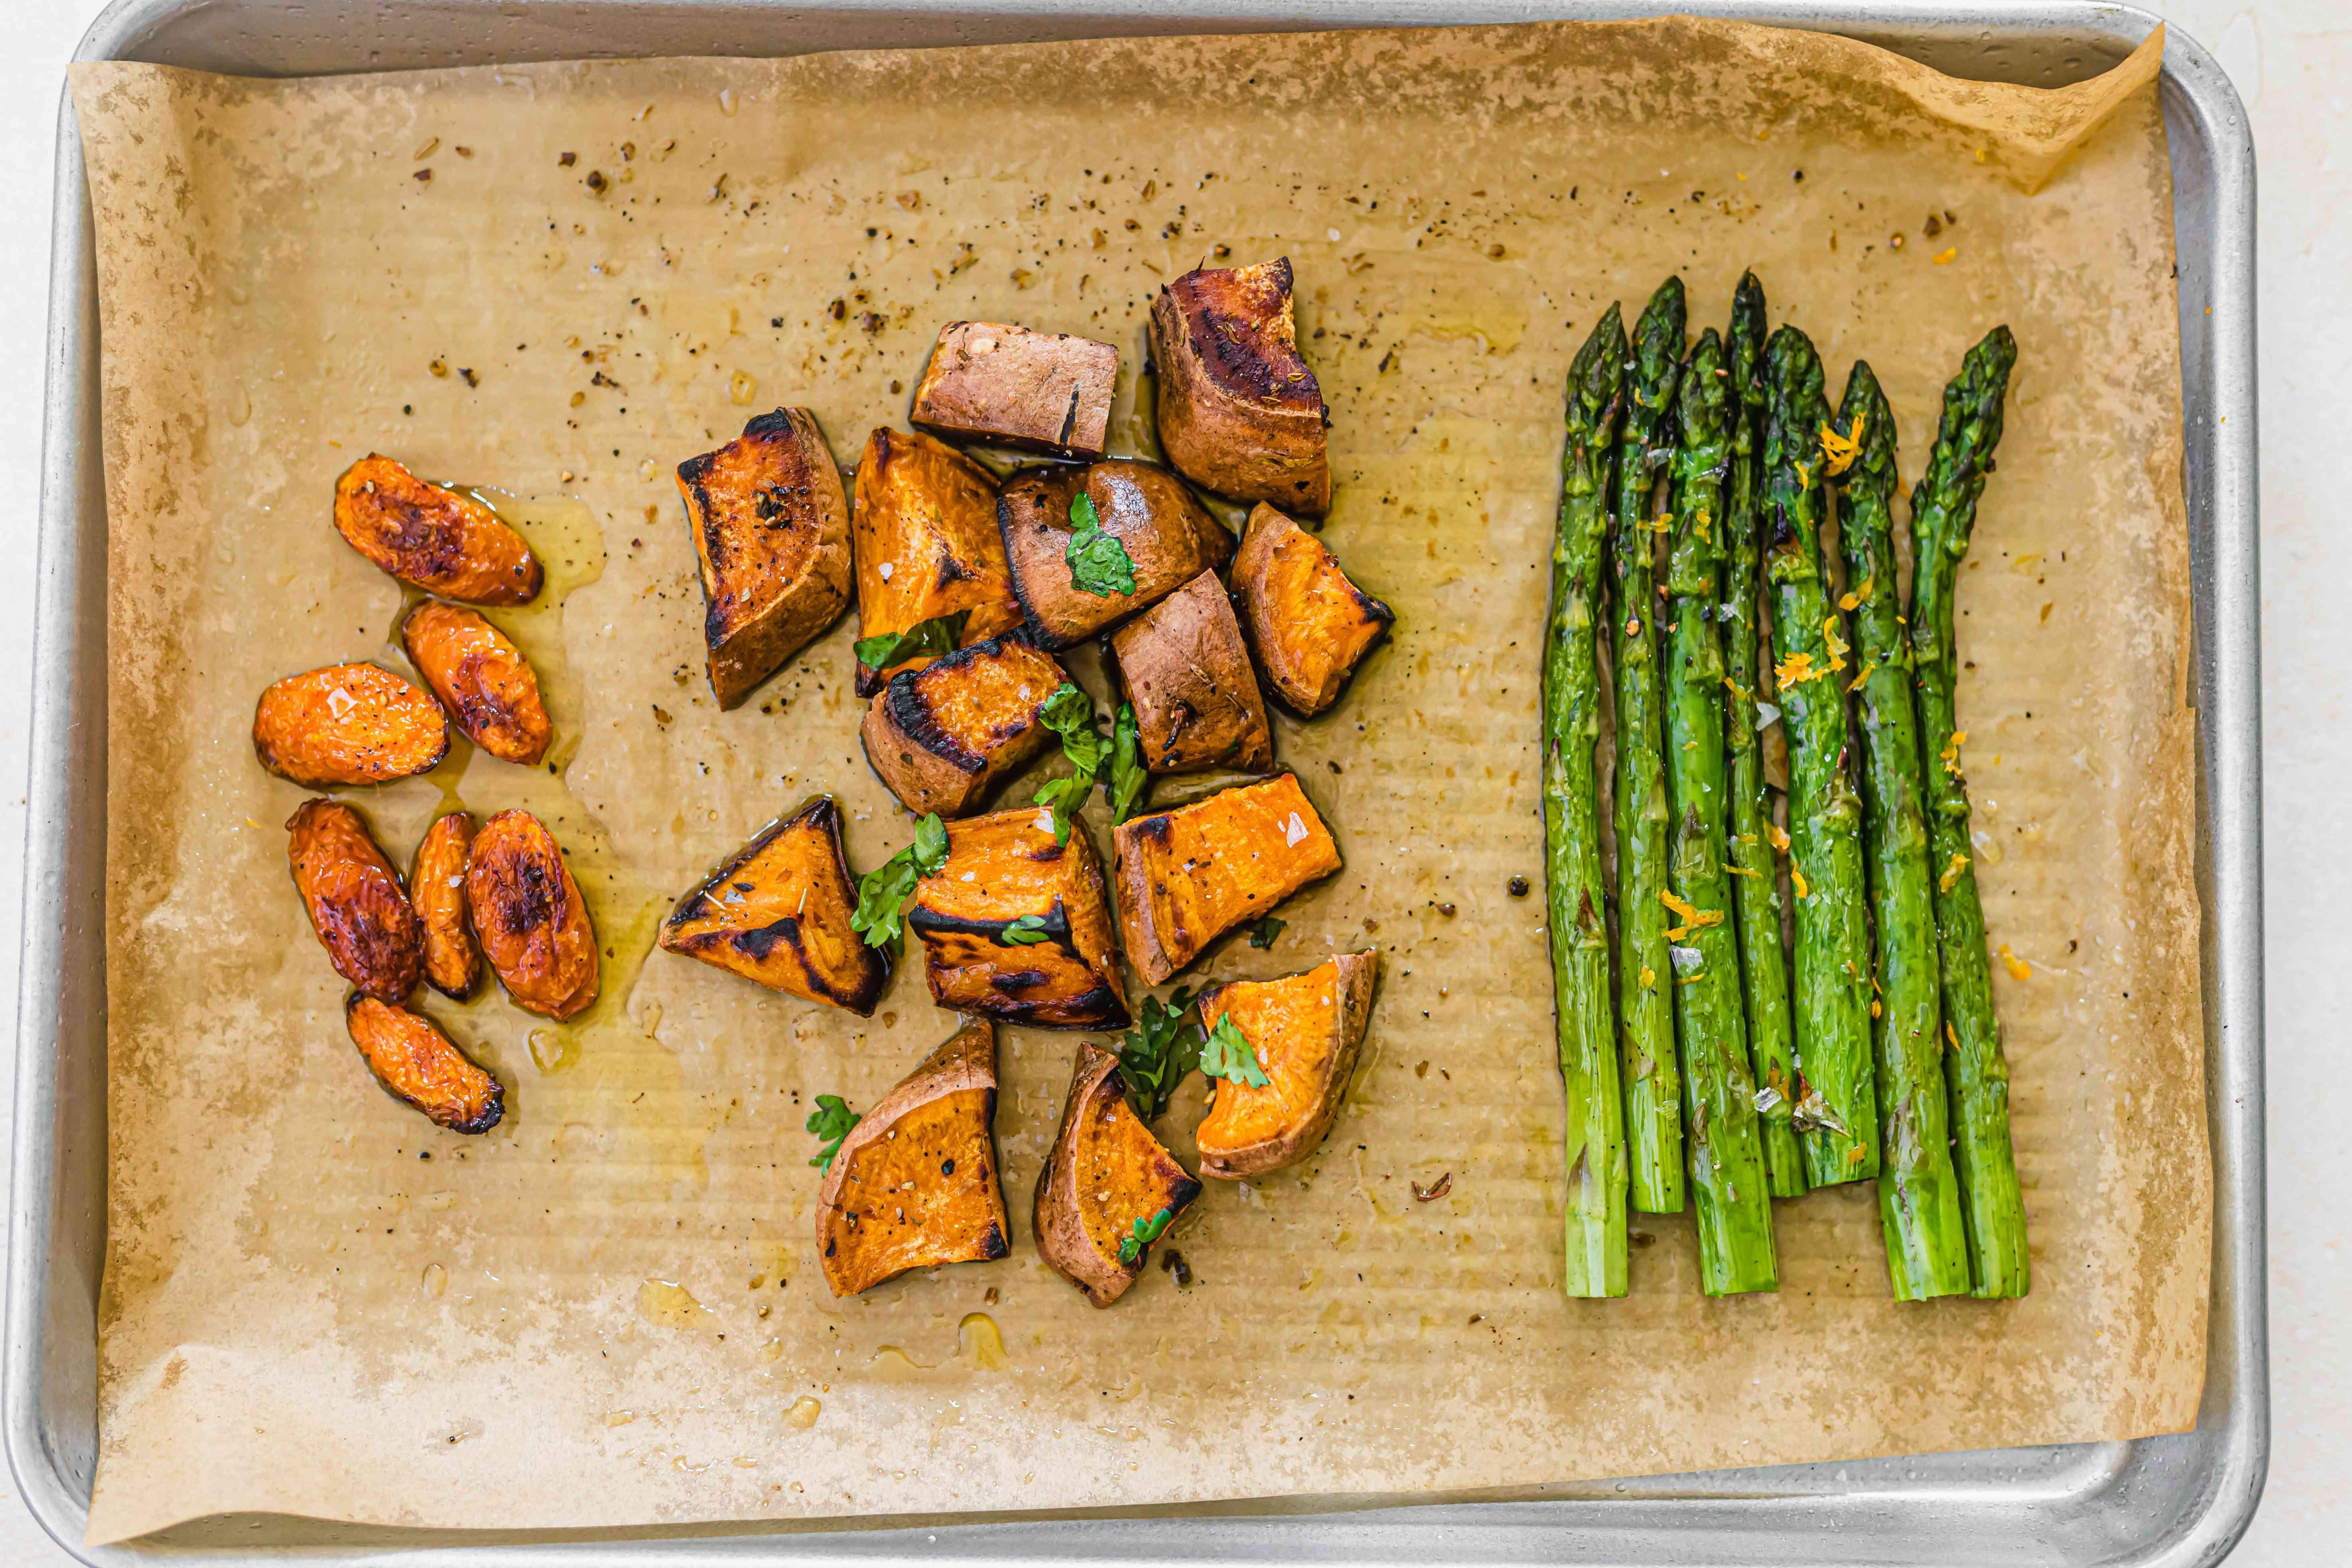 Roasted carrots sweet potatoes asparagus on a sheet pan